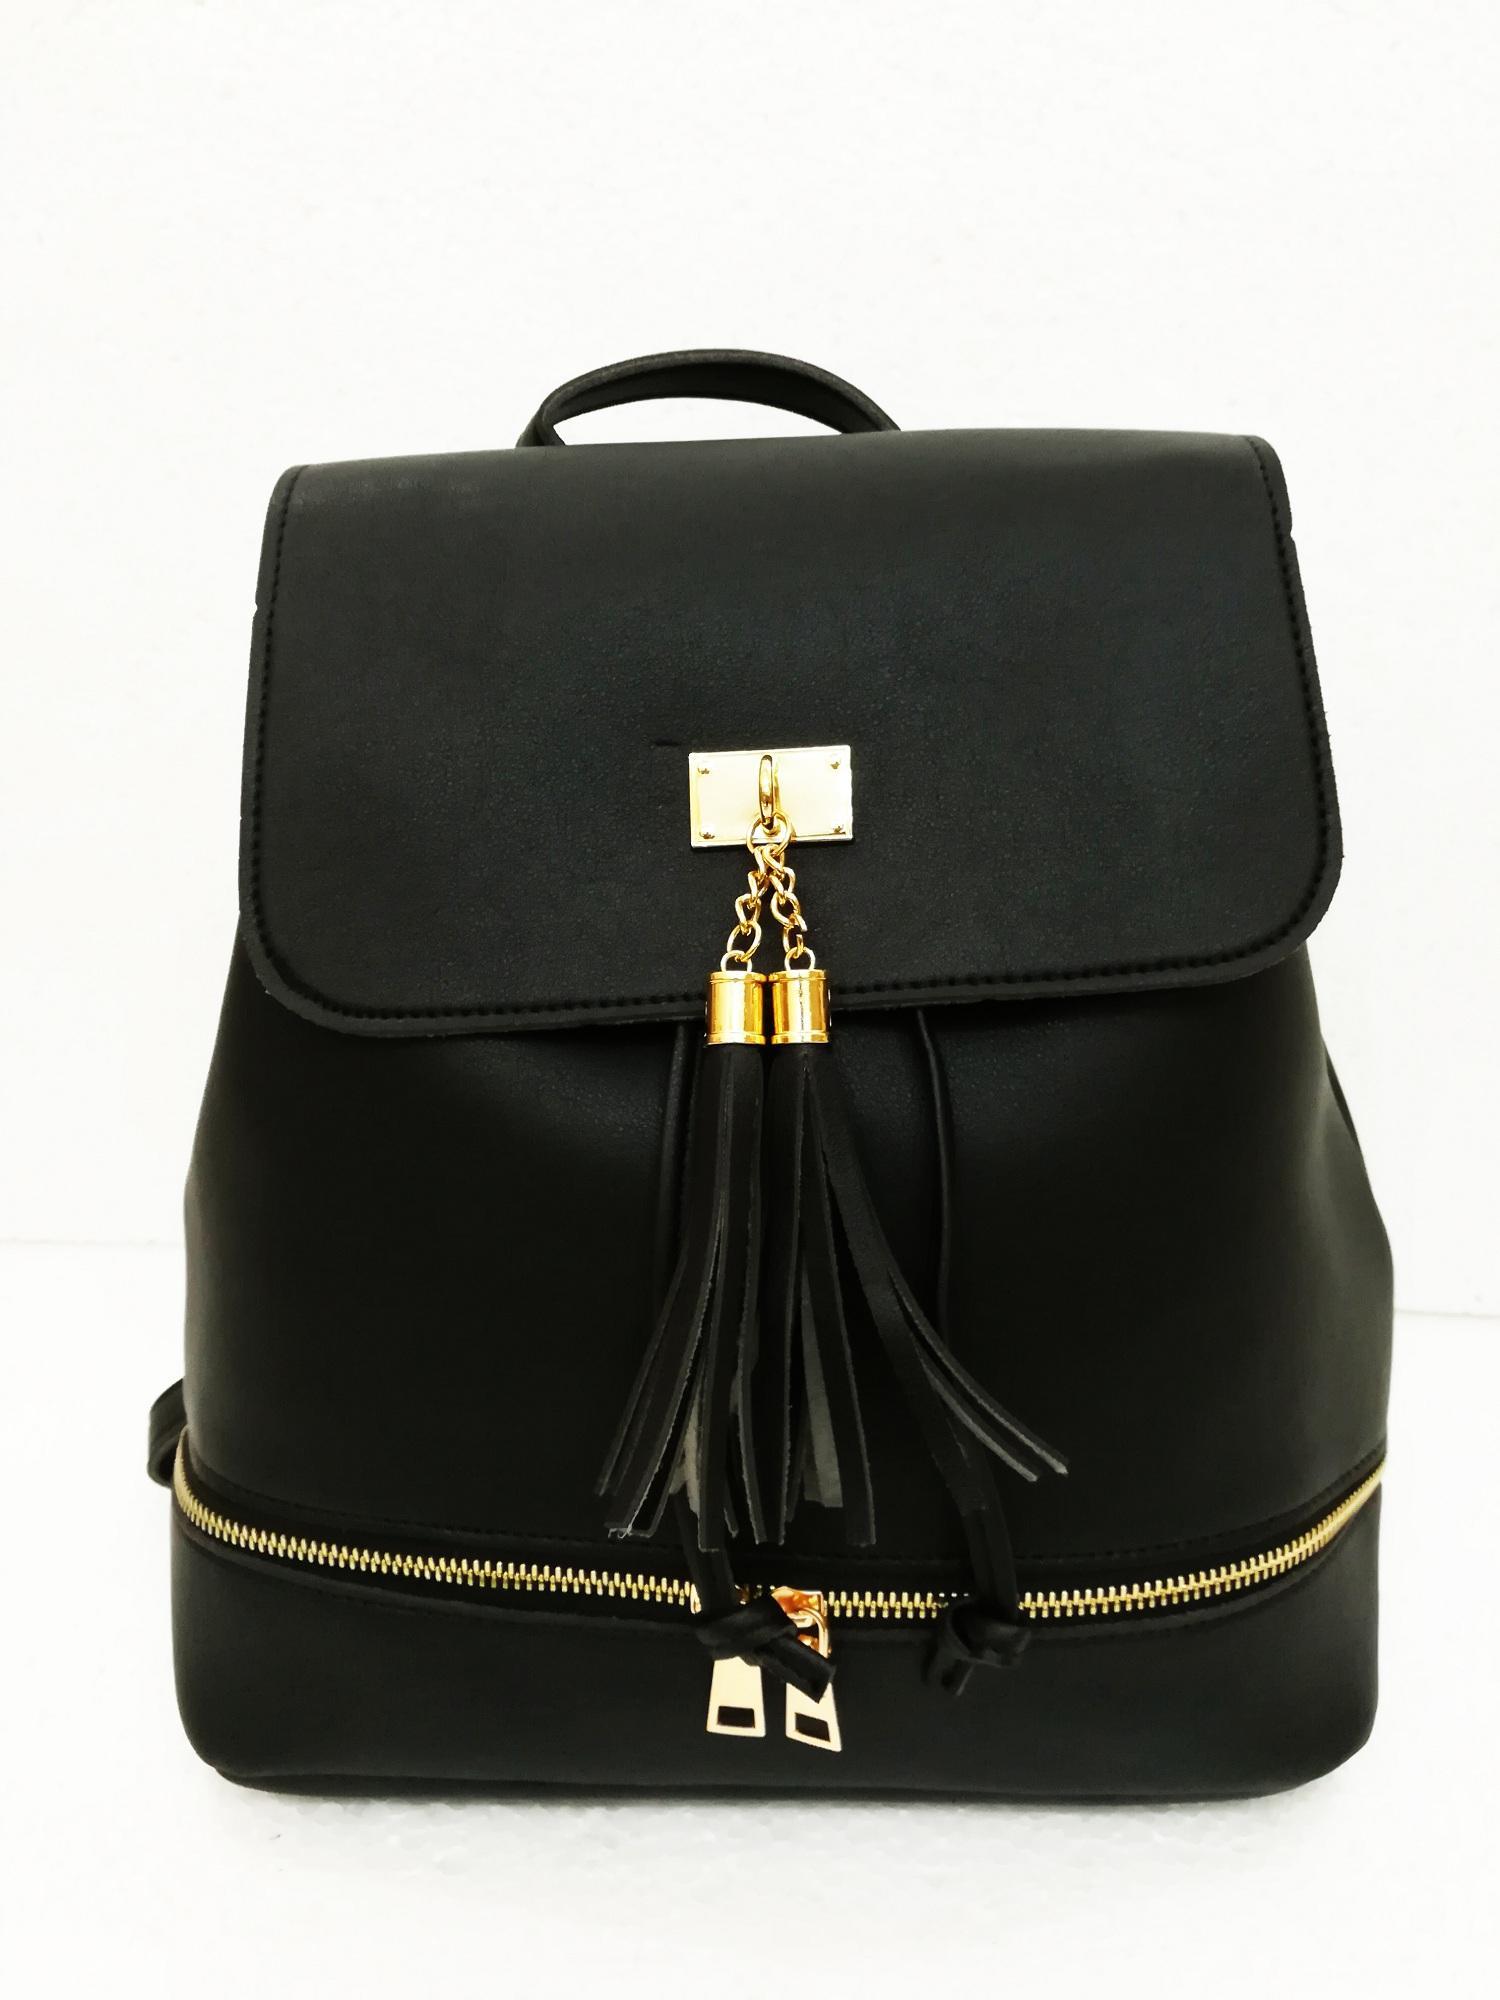 Buy ClassyMissyPk Women Backpacks at Best Prices Online in Pakistan ... 33953a0c3cd52